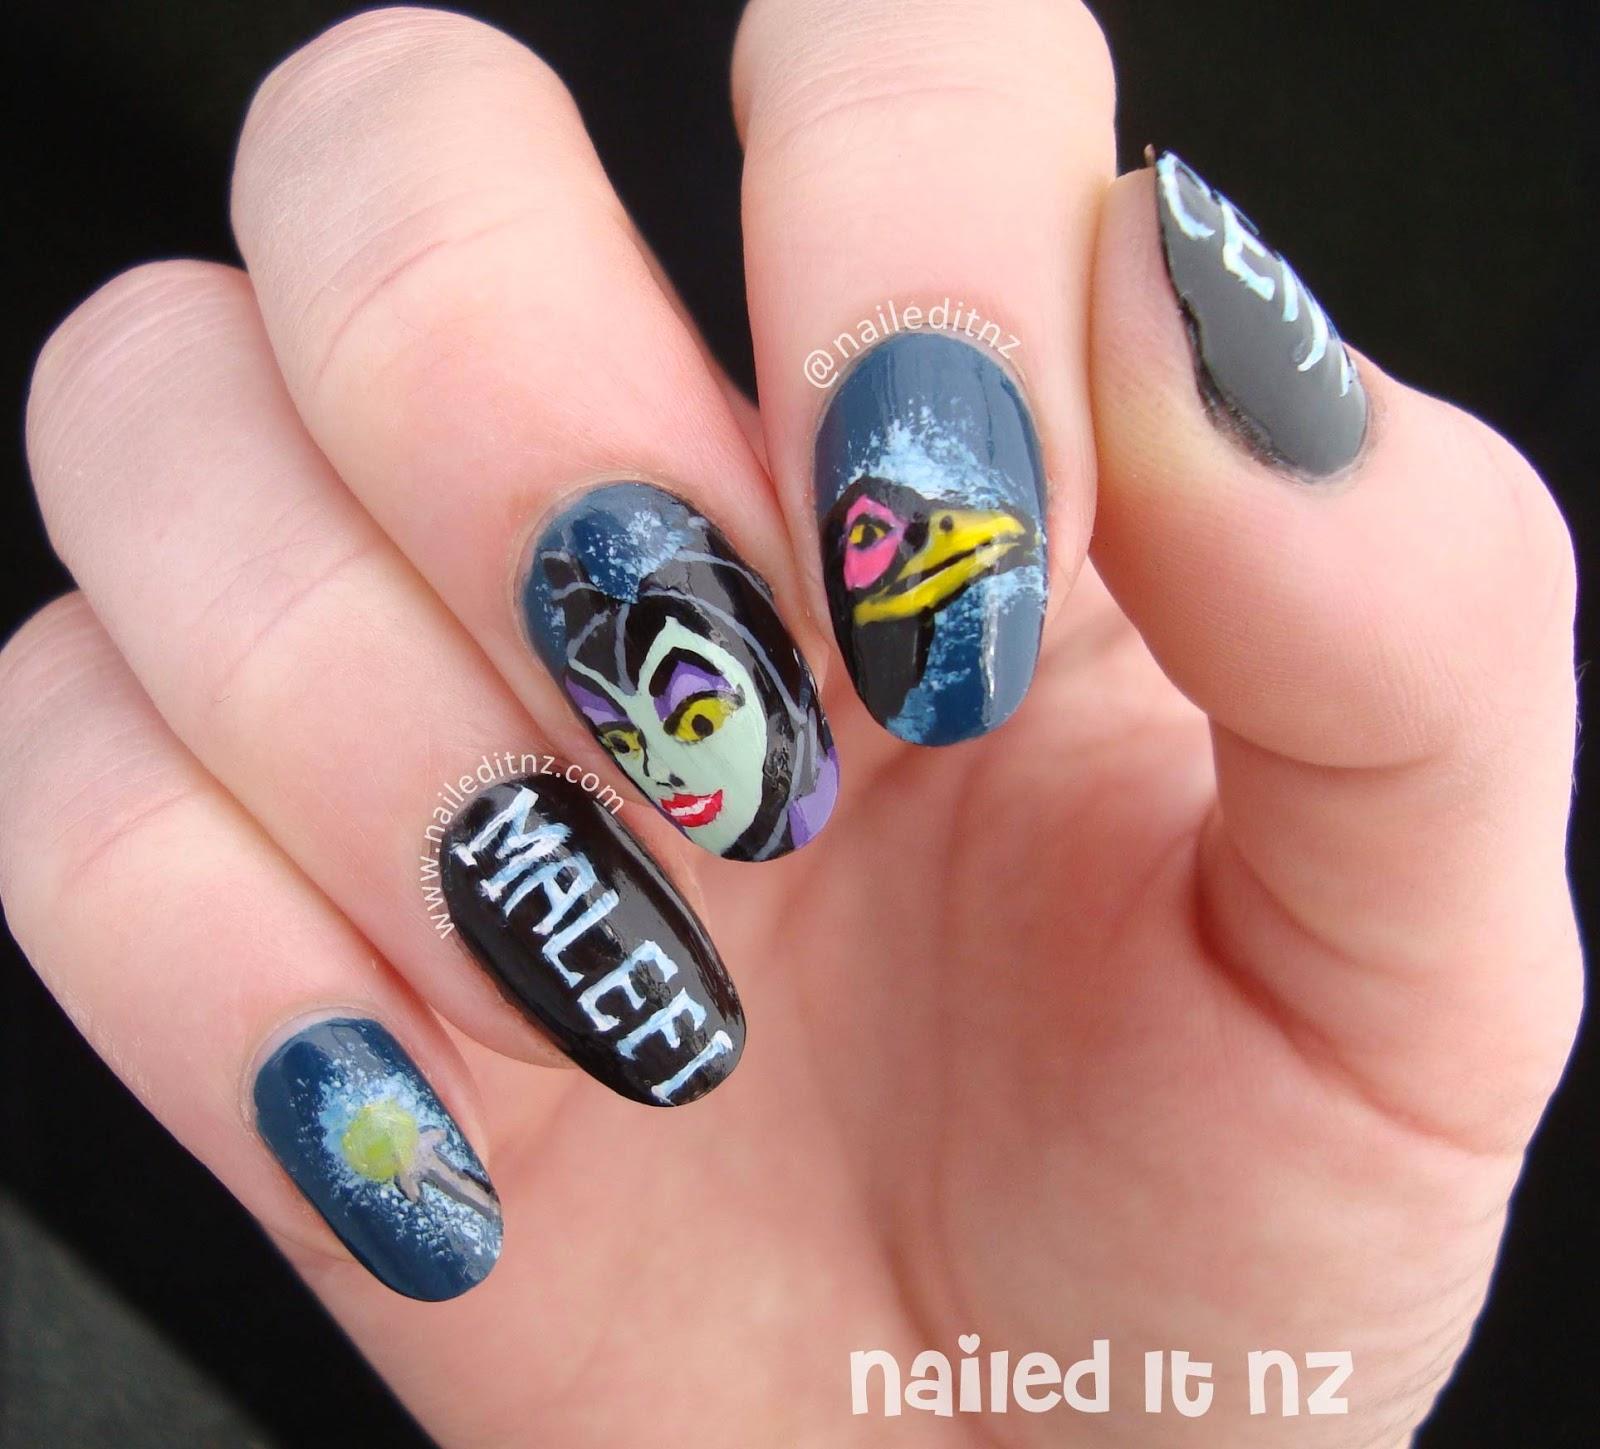 Disney Nail Art #7 | Sleeping Beauty & Maleficent